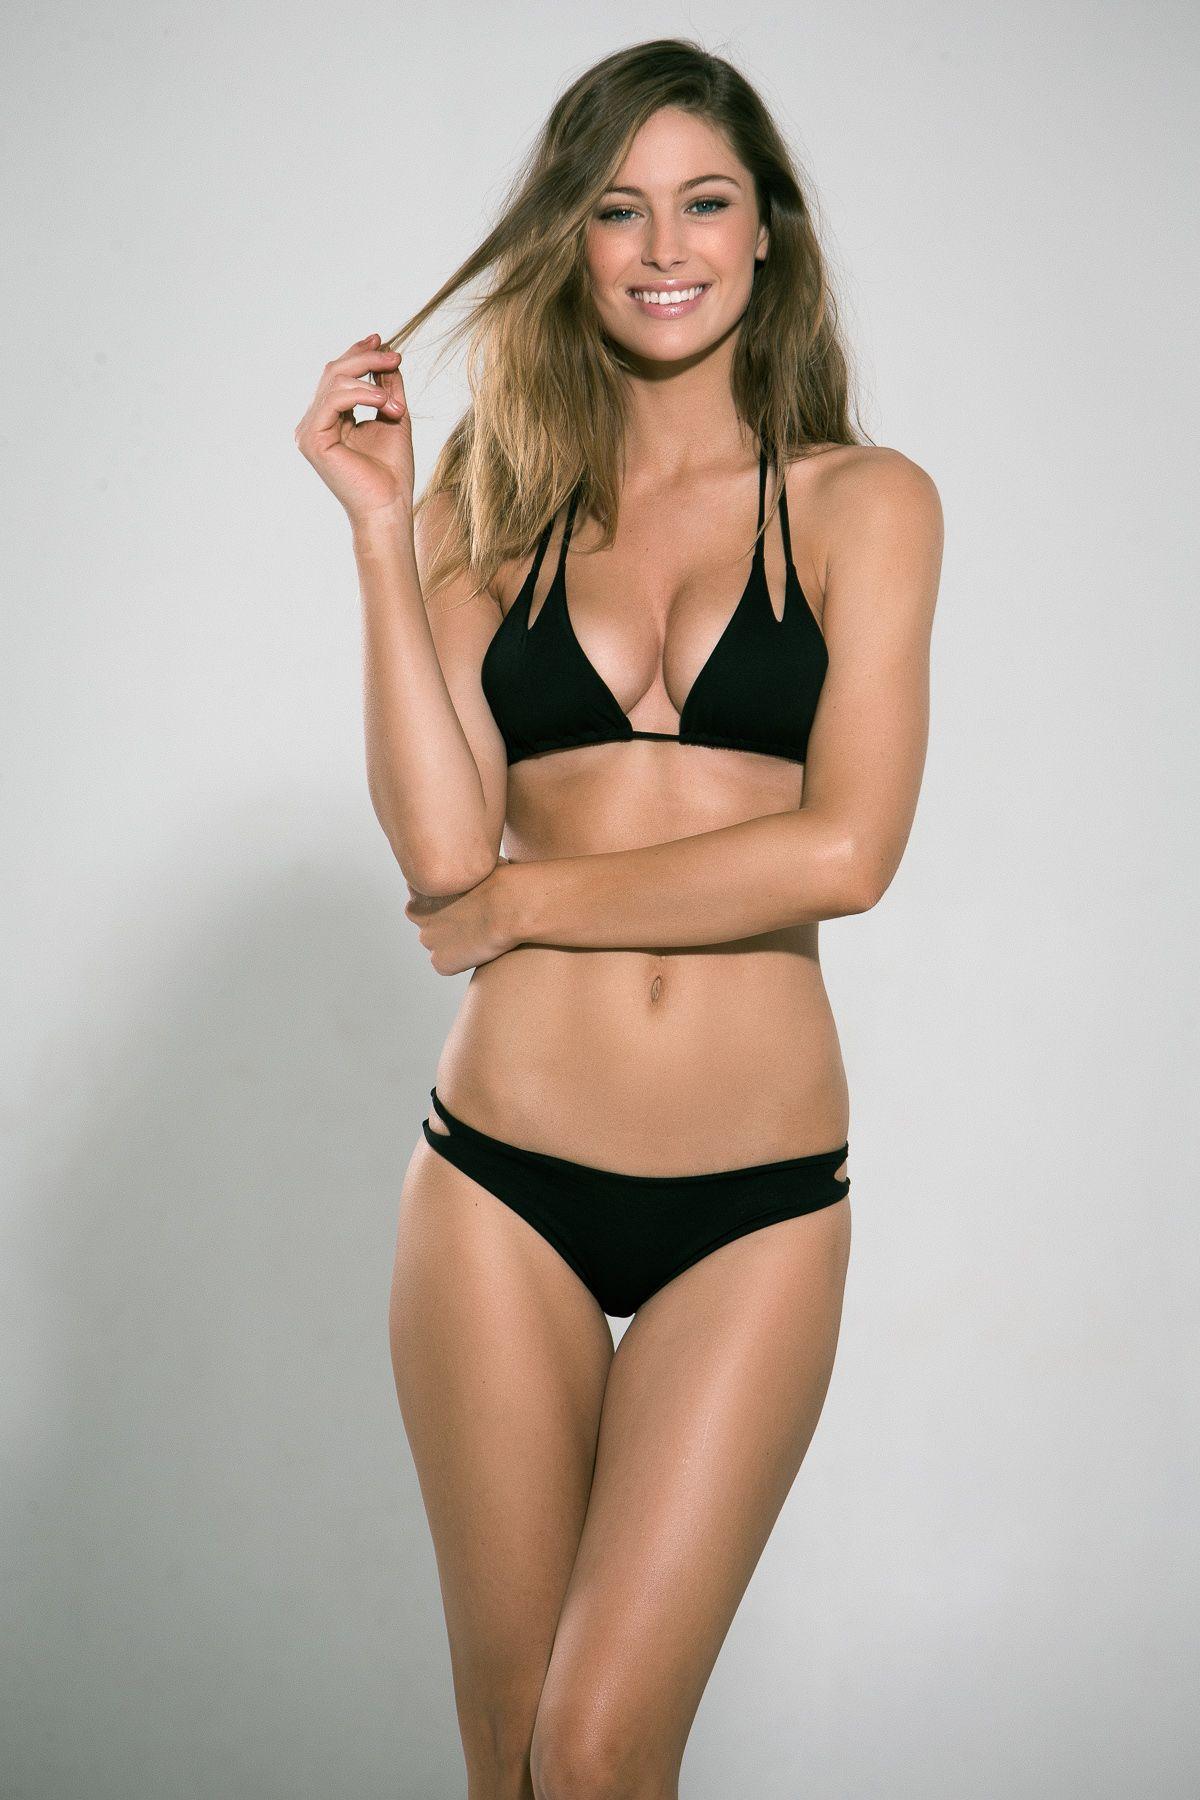 jenny skavlan sexy sexy meldinger